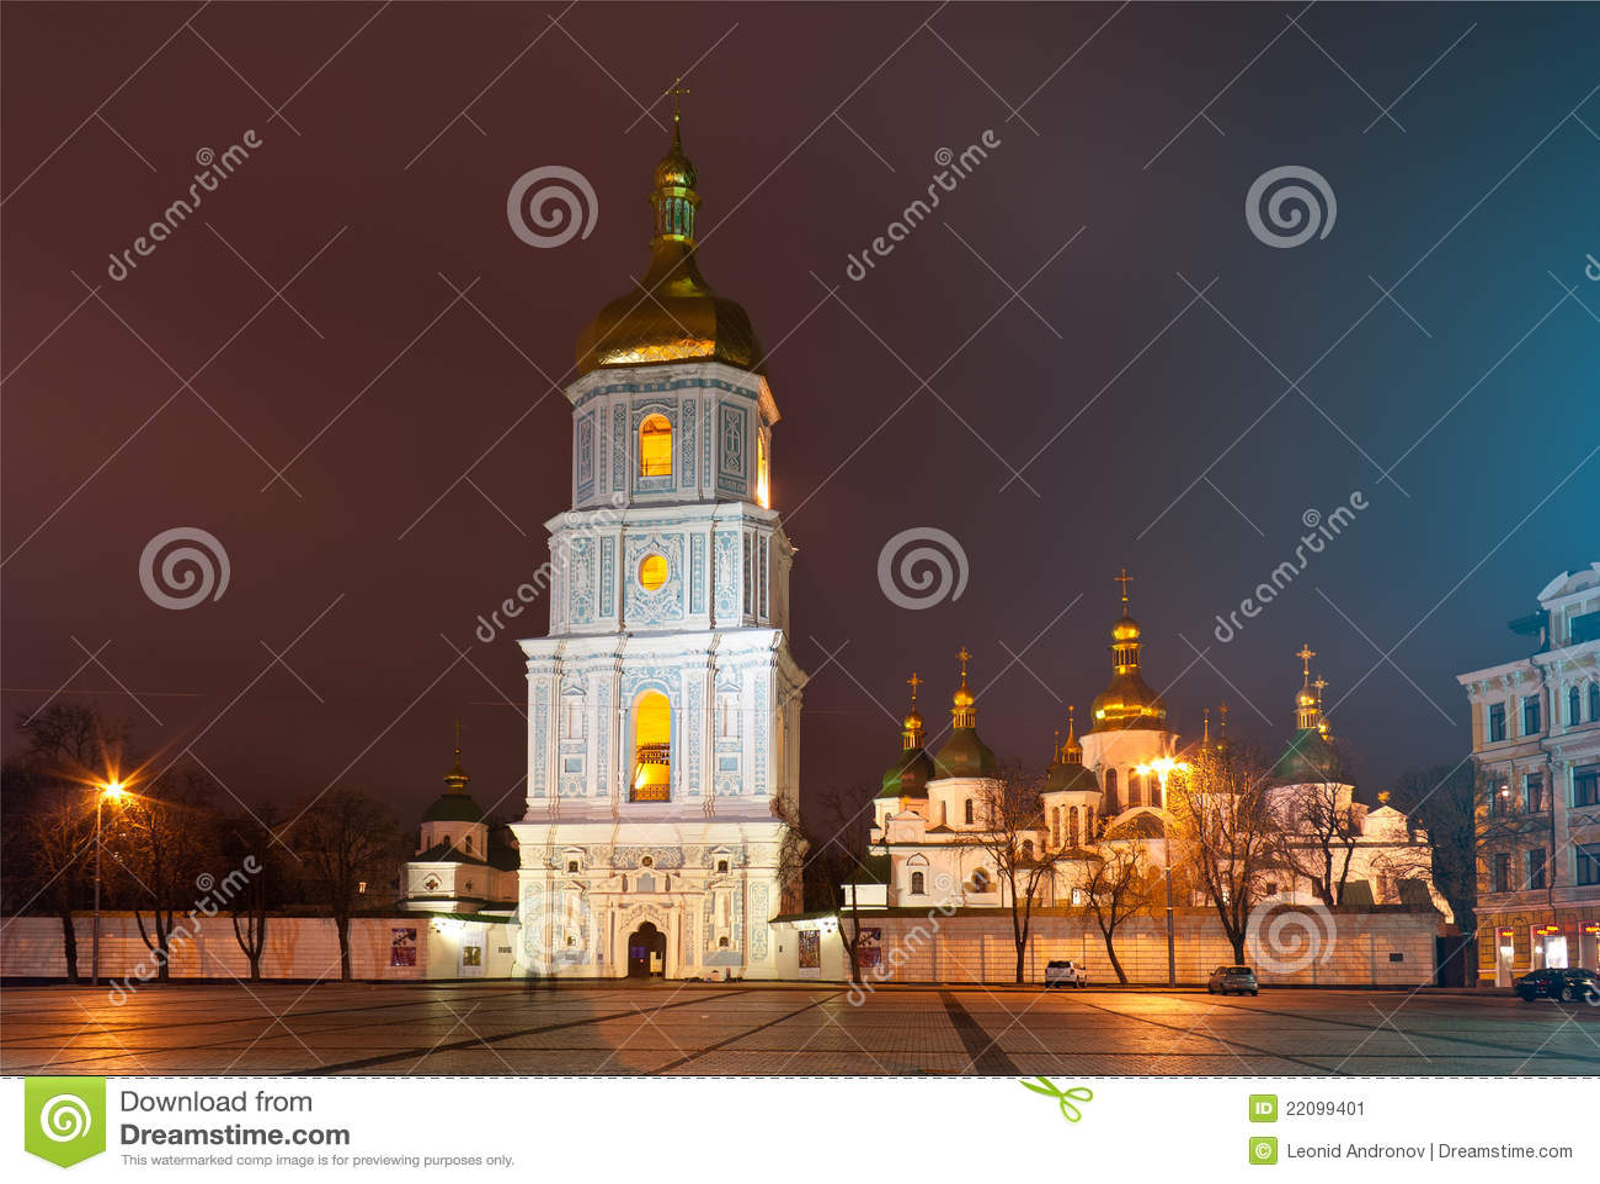 W Kyiv St. Katedra Sophia, Ukraina